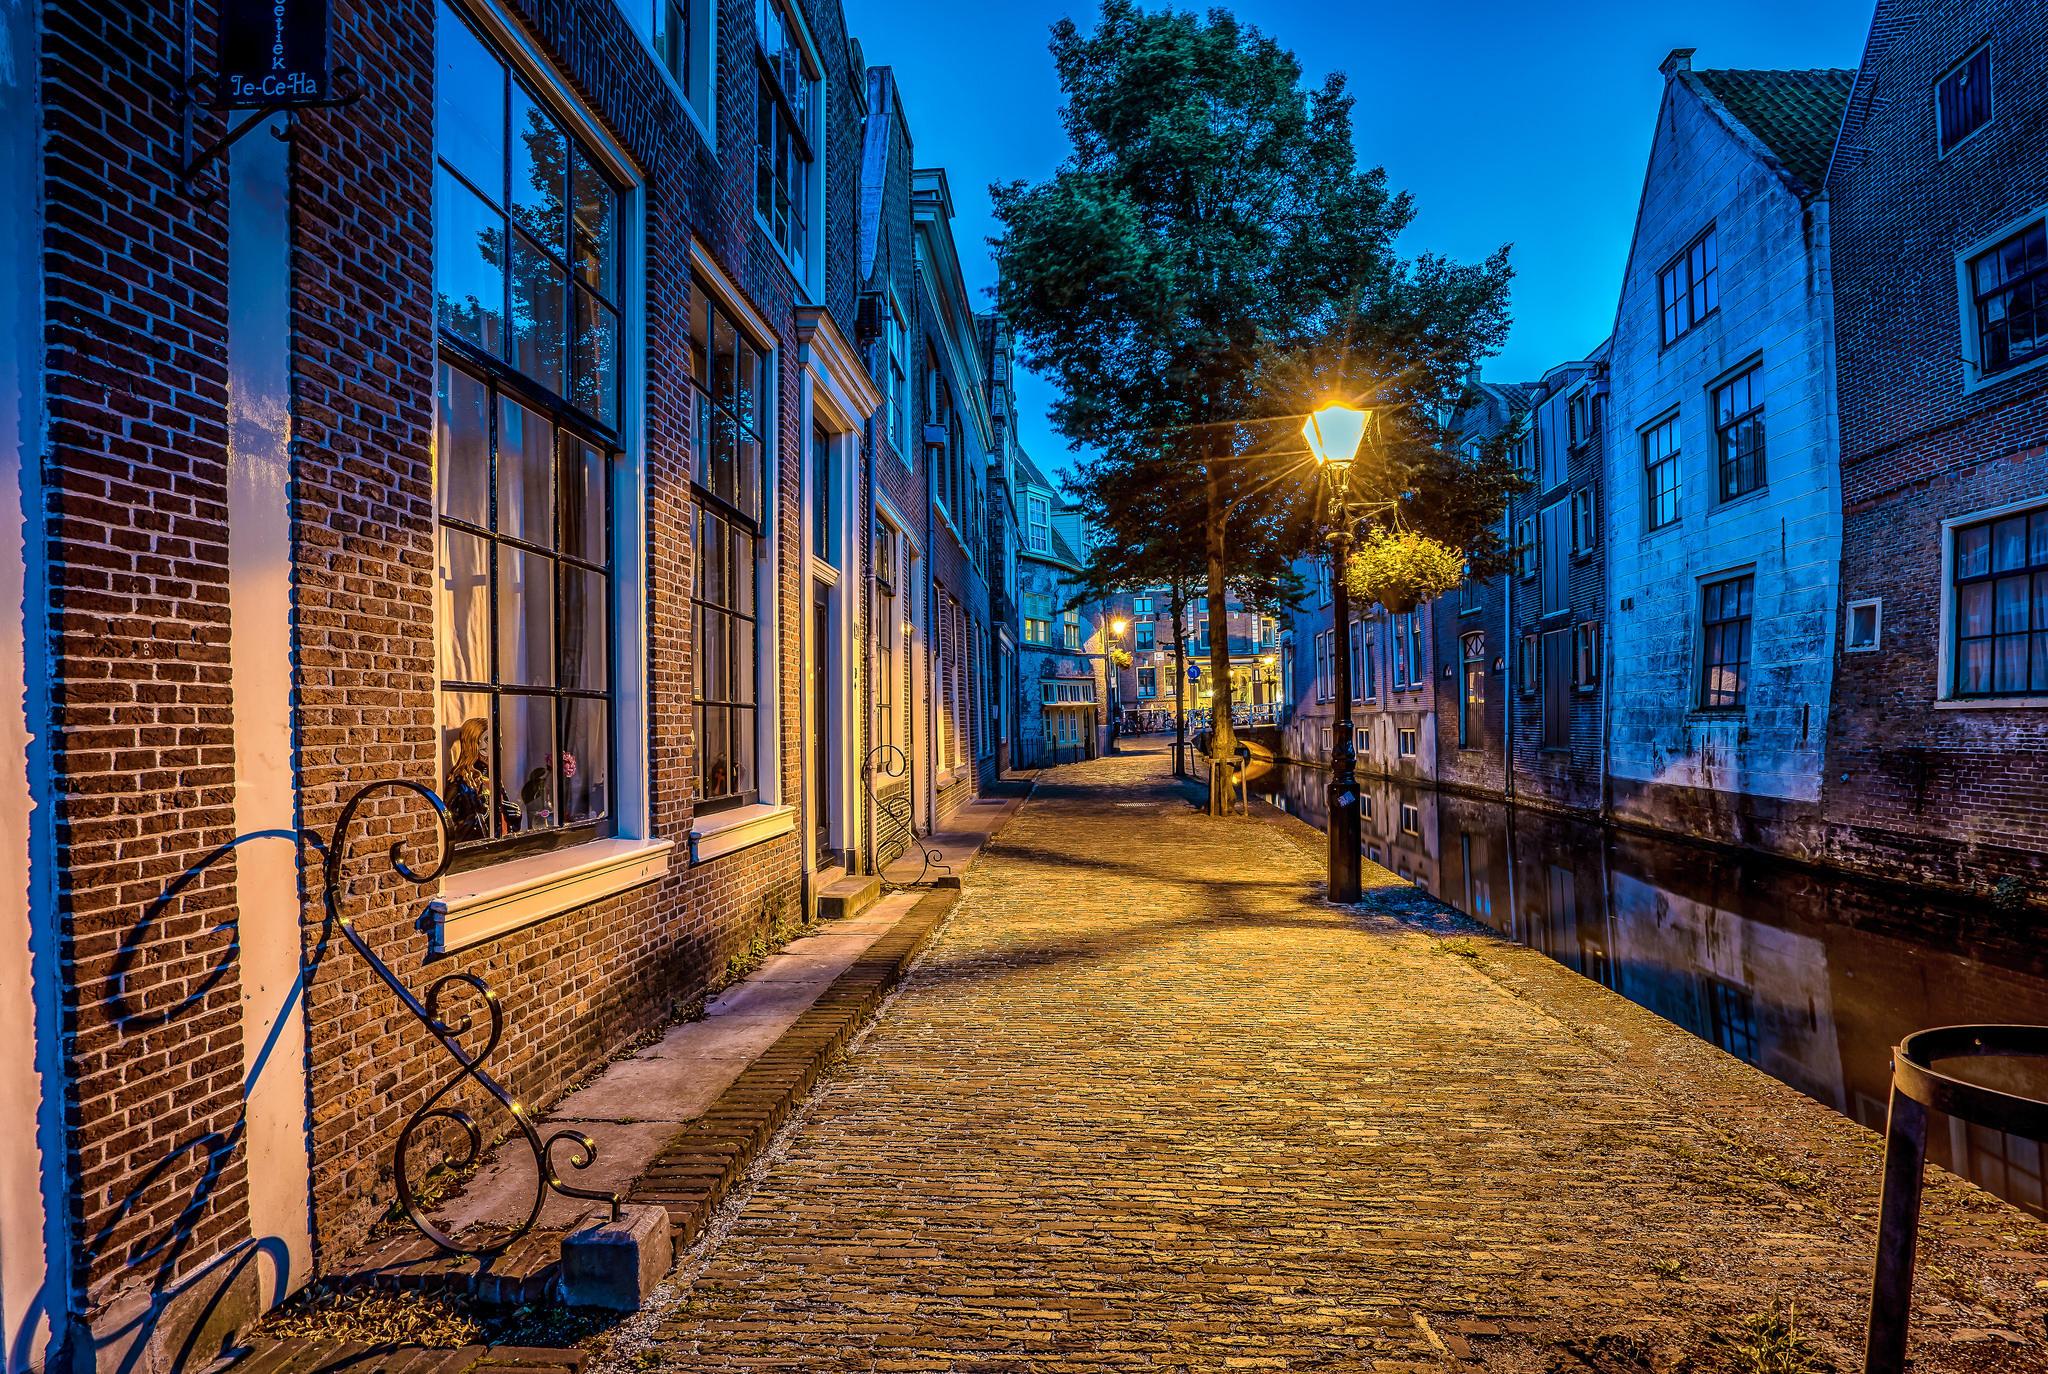 обои Алкмар, Нидерланды, Северная Голландия, ночь картинки фото